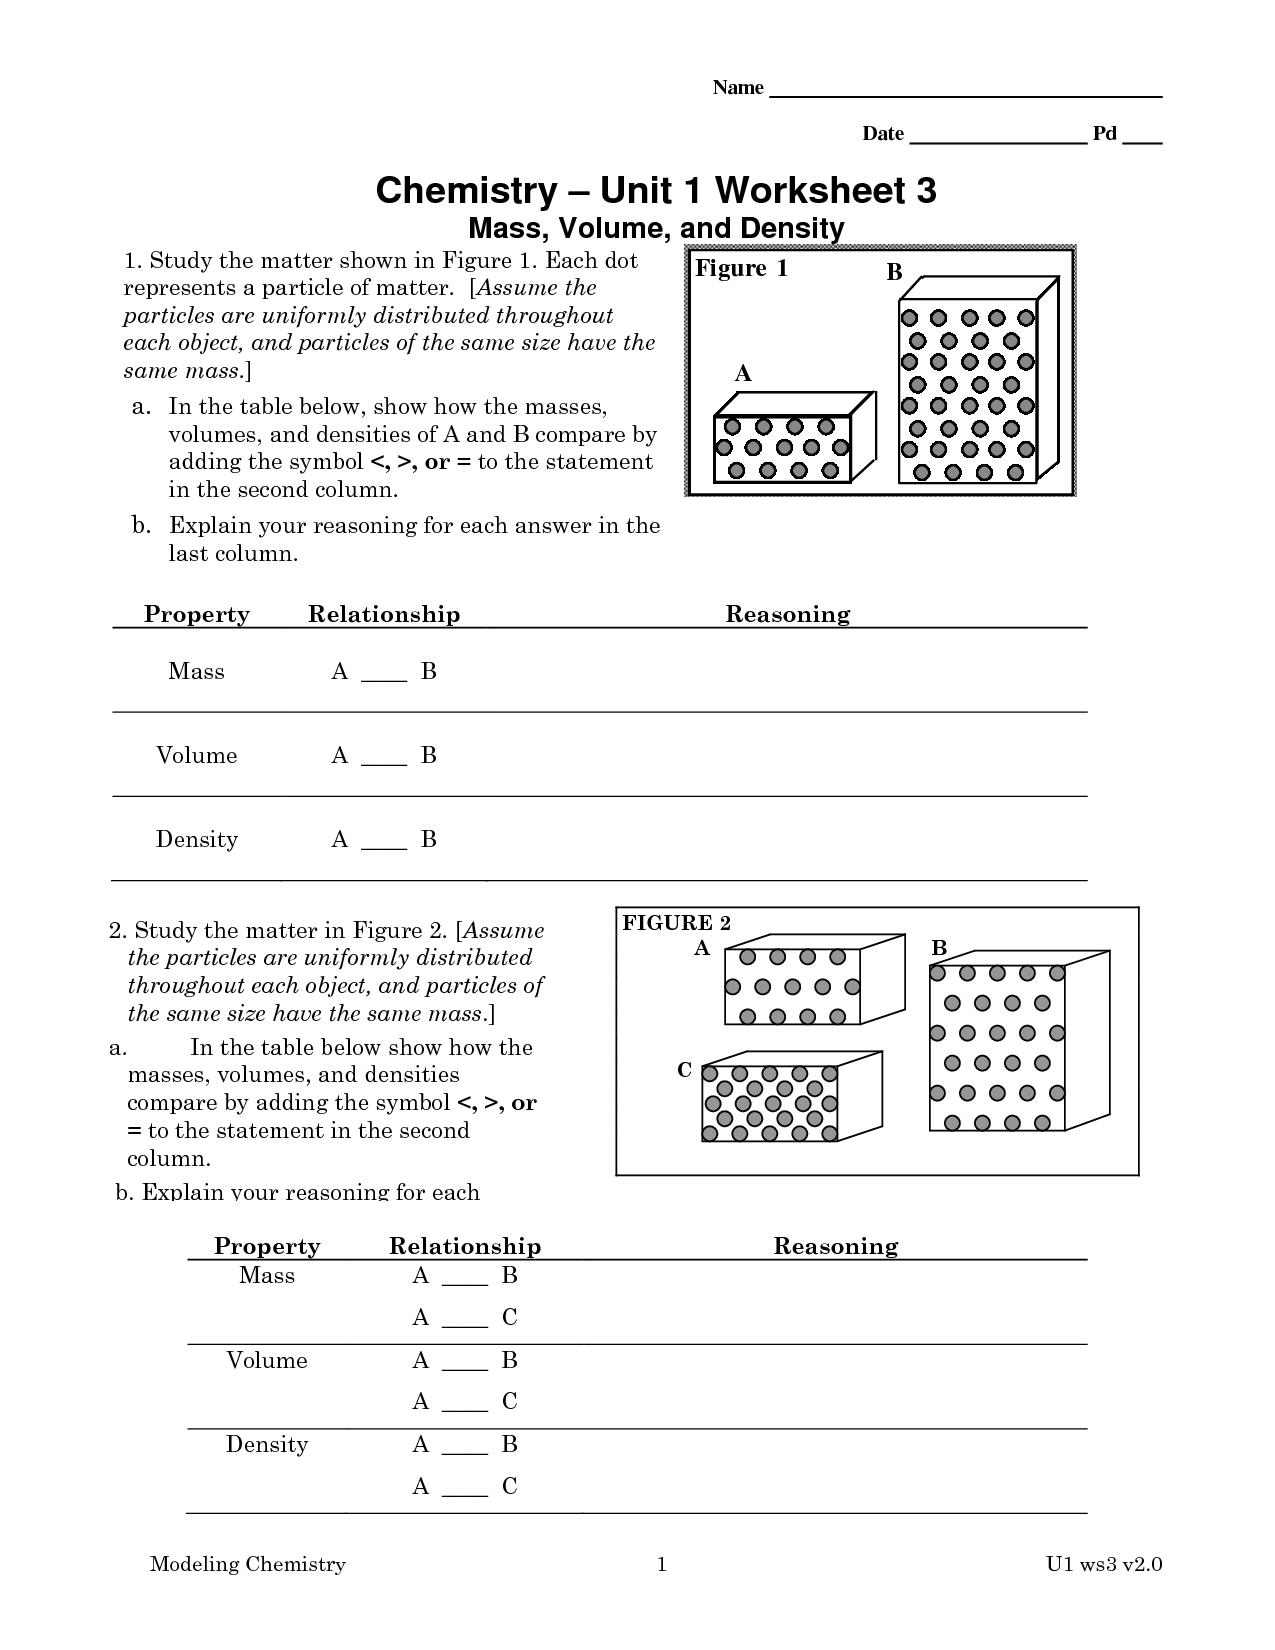 31 Chemistry Unit 1 Worksheet 6 Answers - Worksheet ...